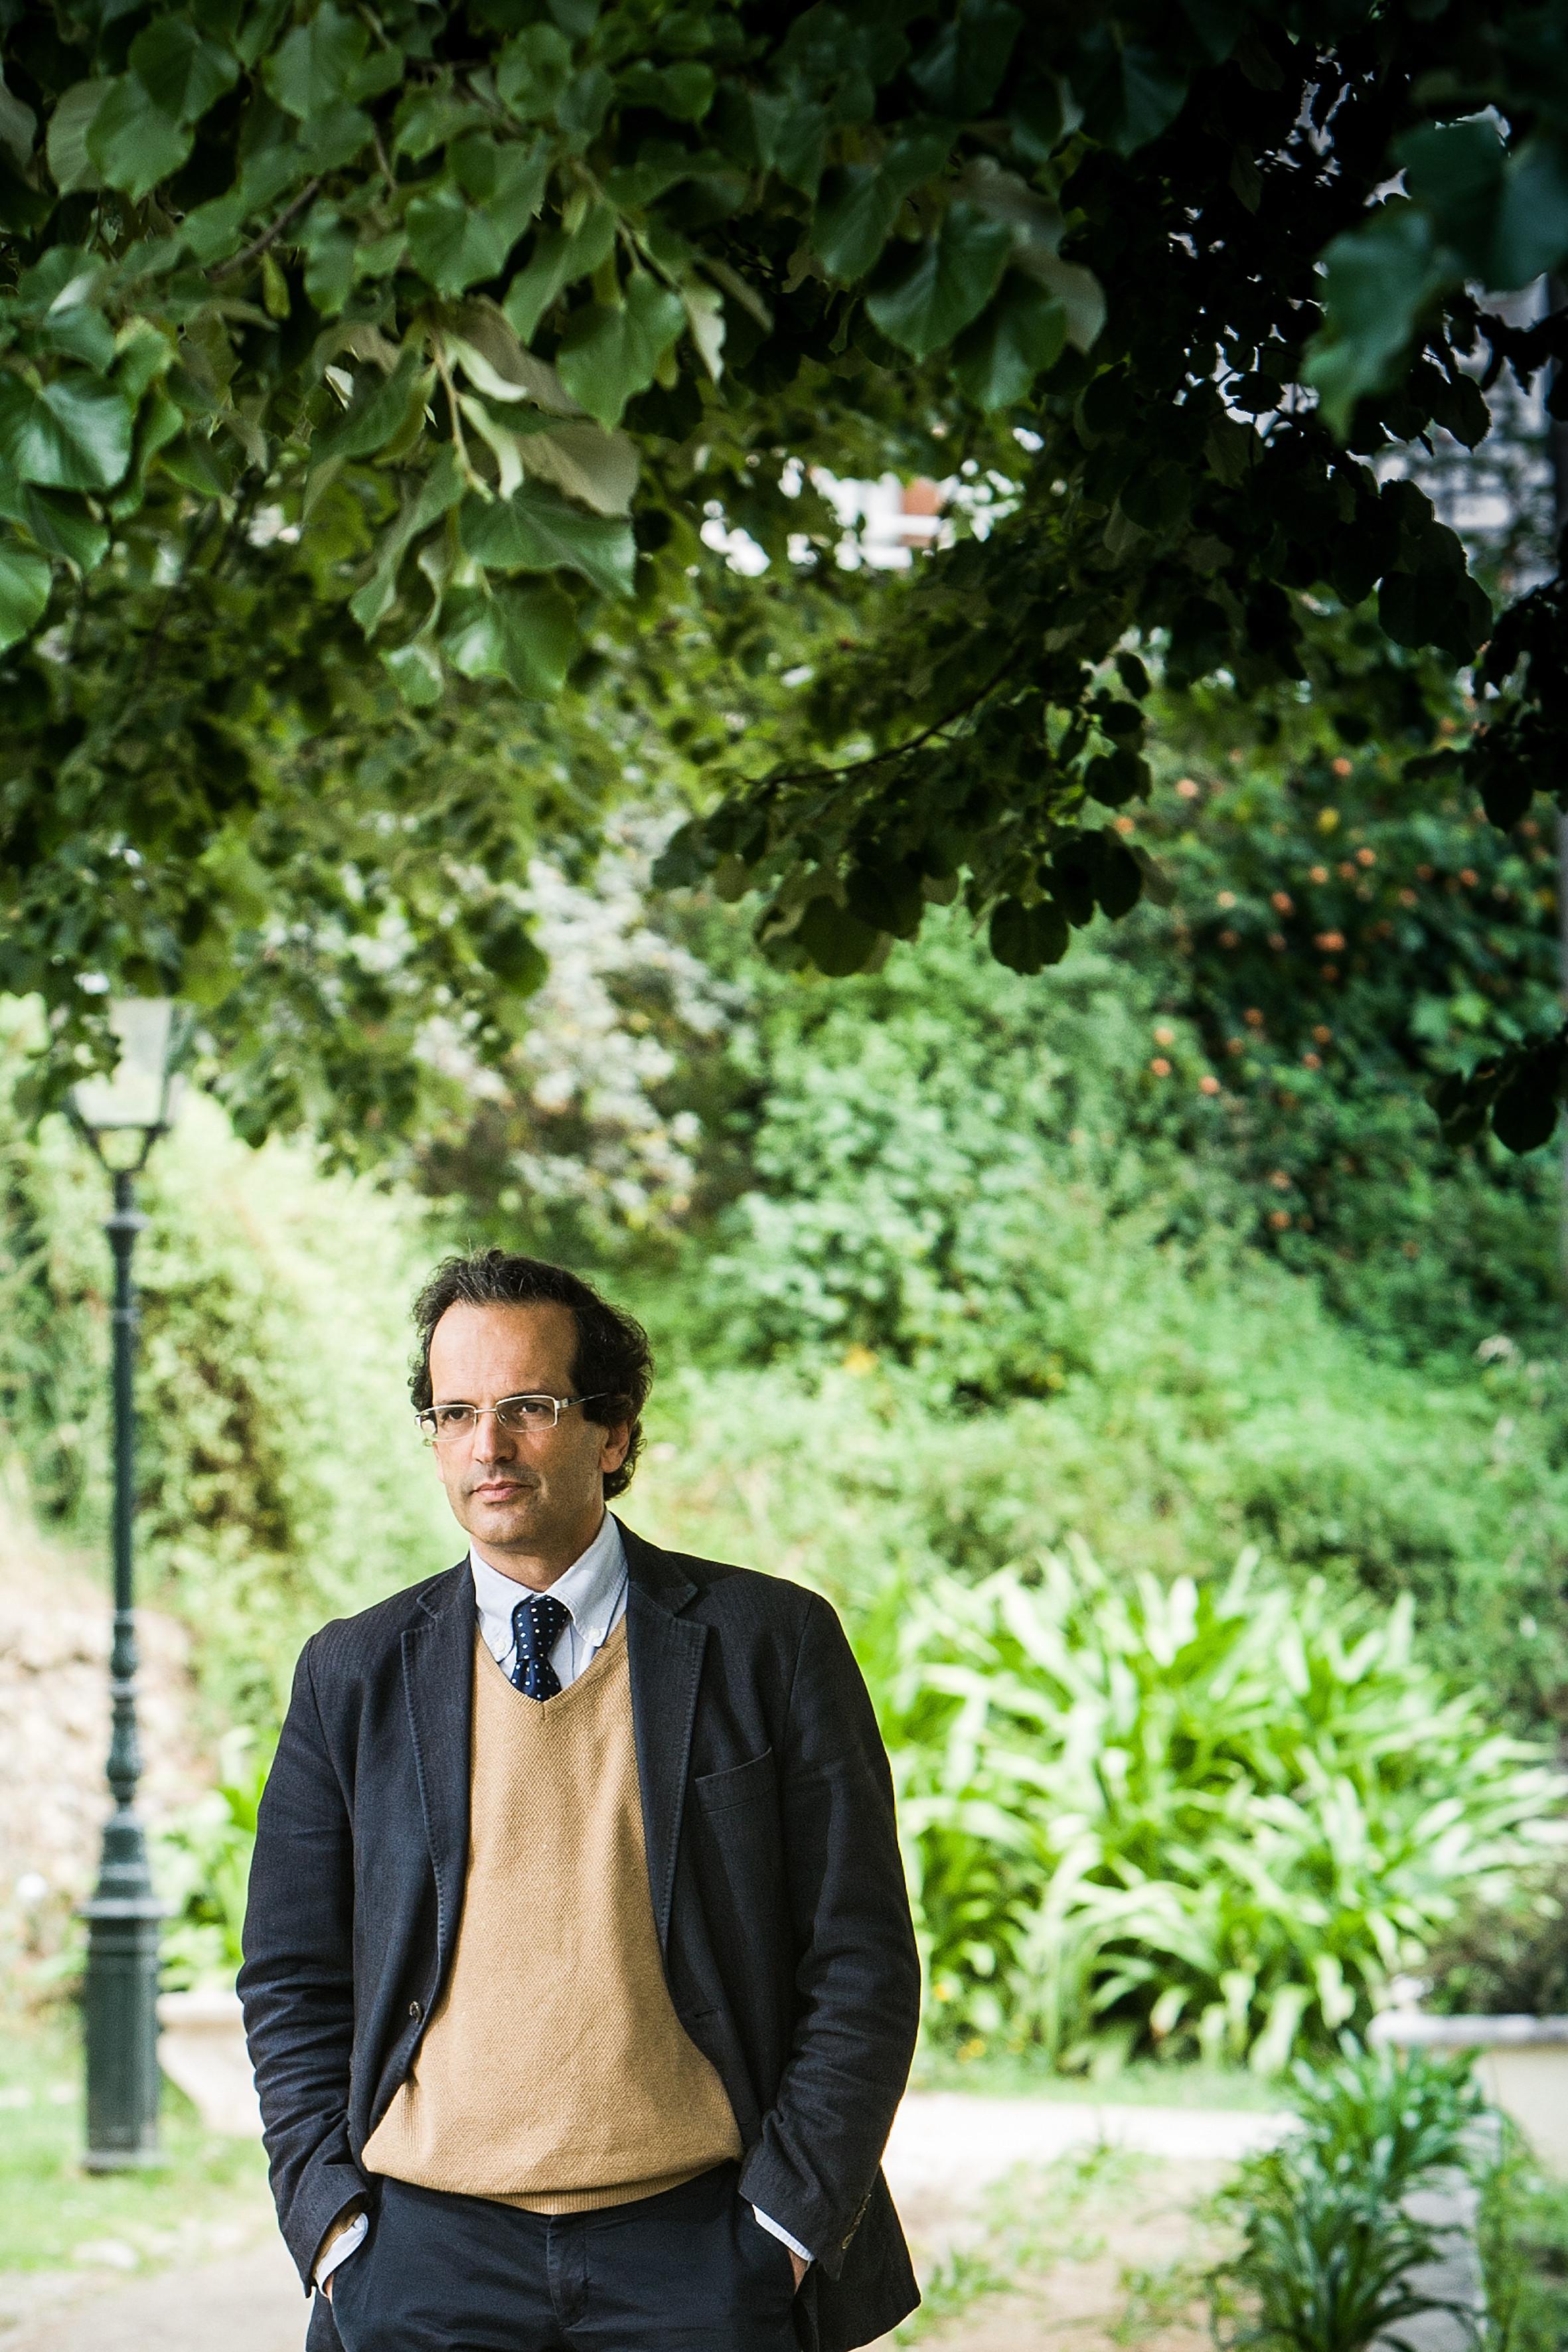 Paulo Trigo Pereira quer alargar âmbito de iniciativas legislativas